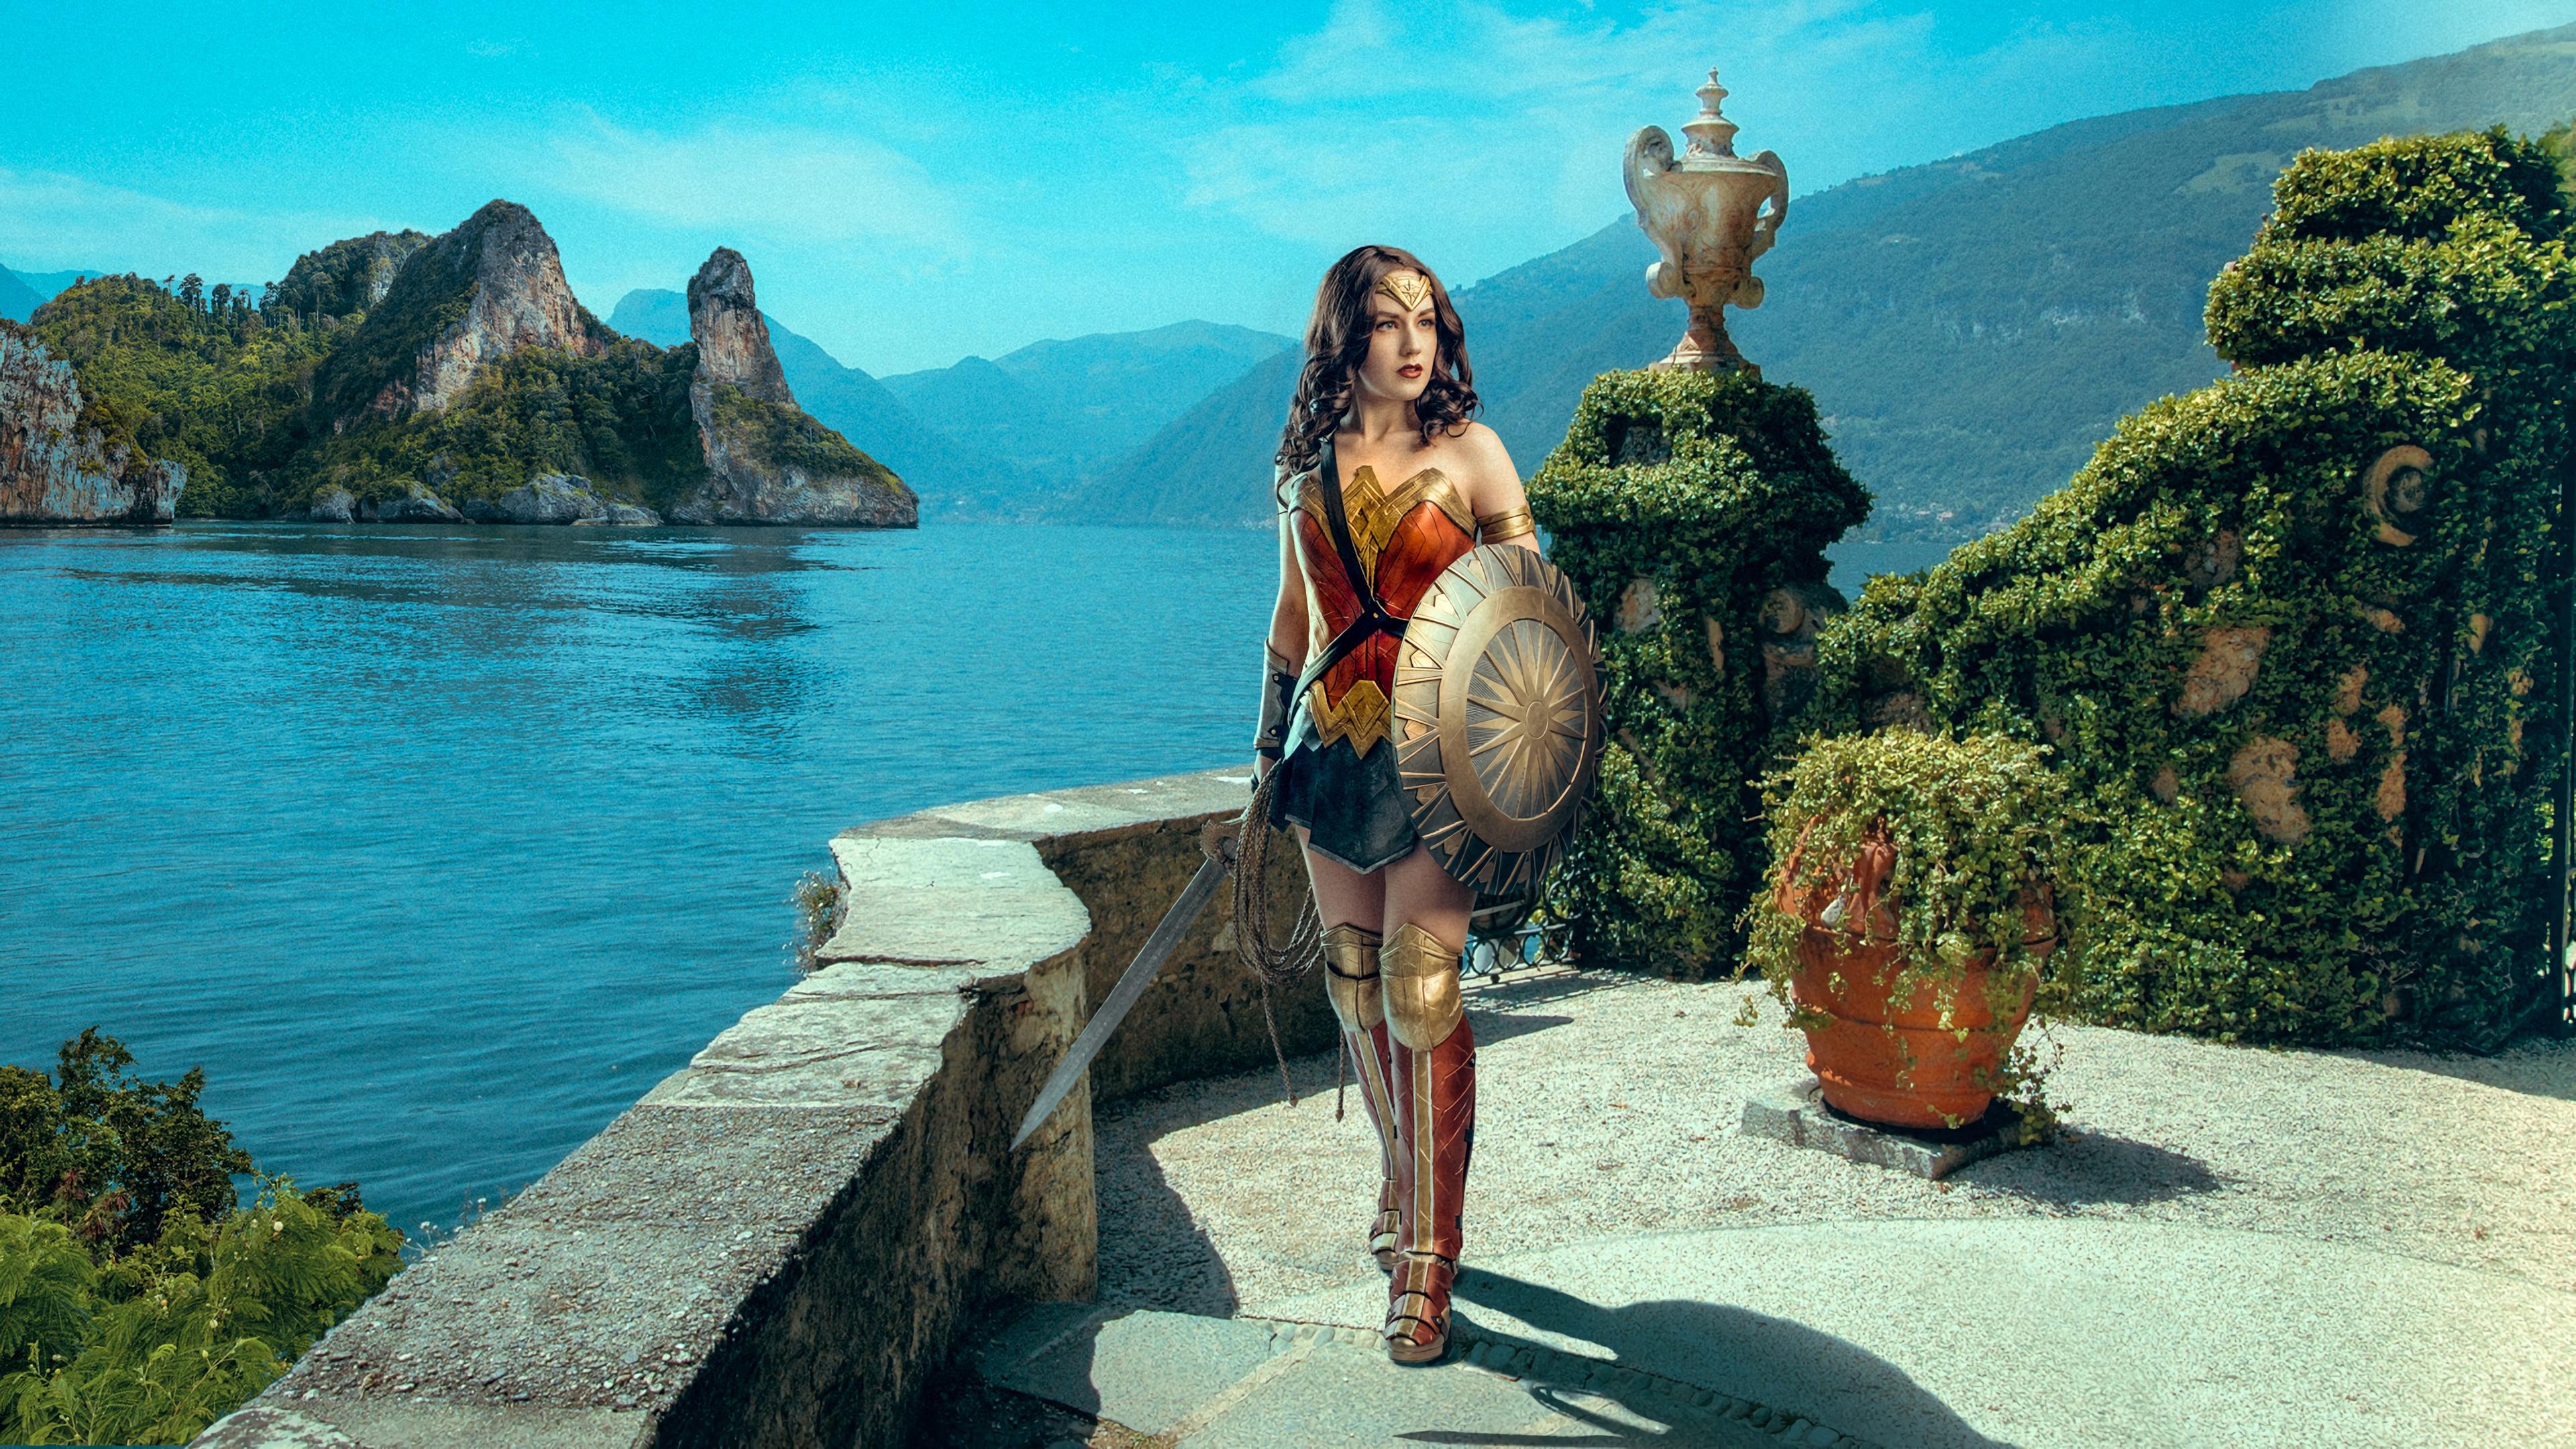 wonder woman cosplay 2019 1568054219 - wonder Woman Cosplay 2019 - wonder woman wallpapers, superheroes wallpapers, hd-wallpapers, digital art wallpapers, cosplay wallpapers, behance wallpapers, artwork wallpapers, 4k-wallpapers